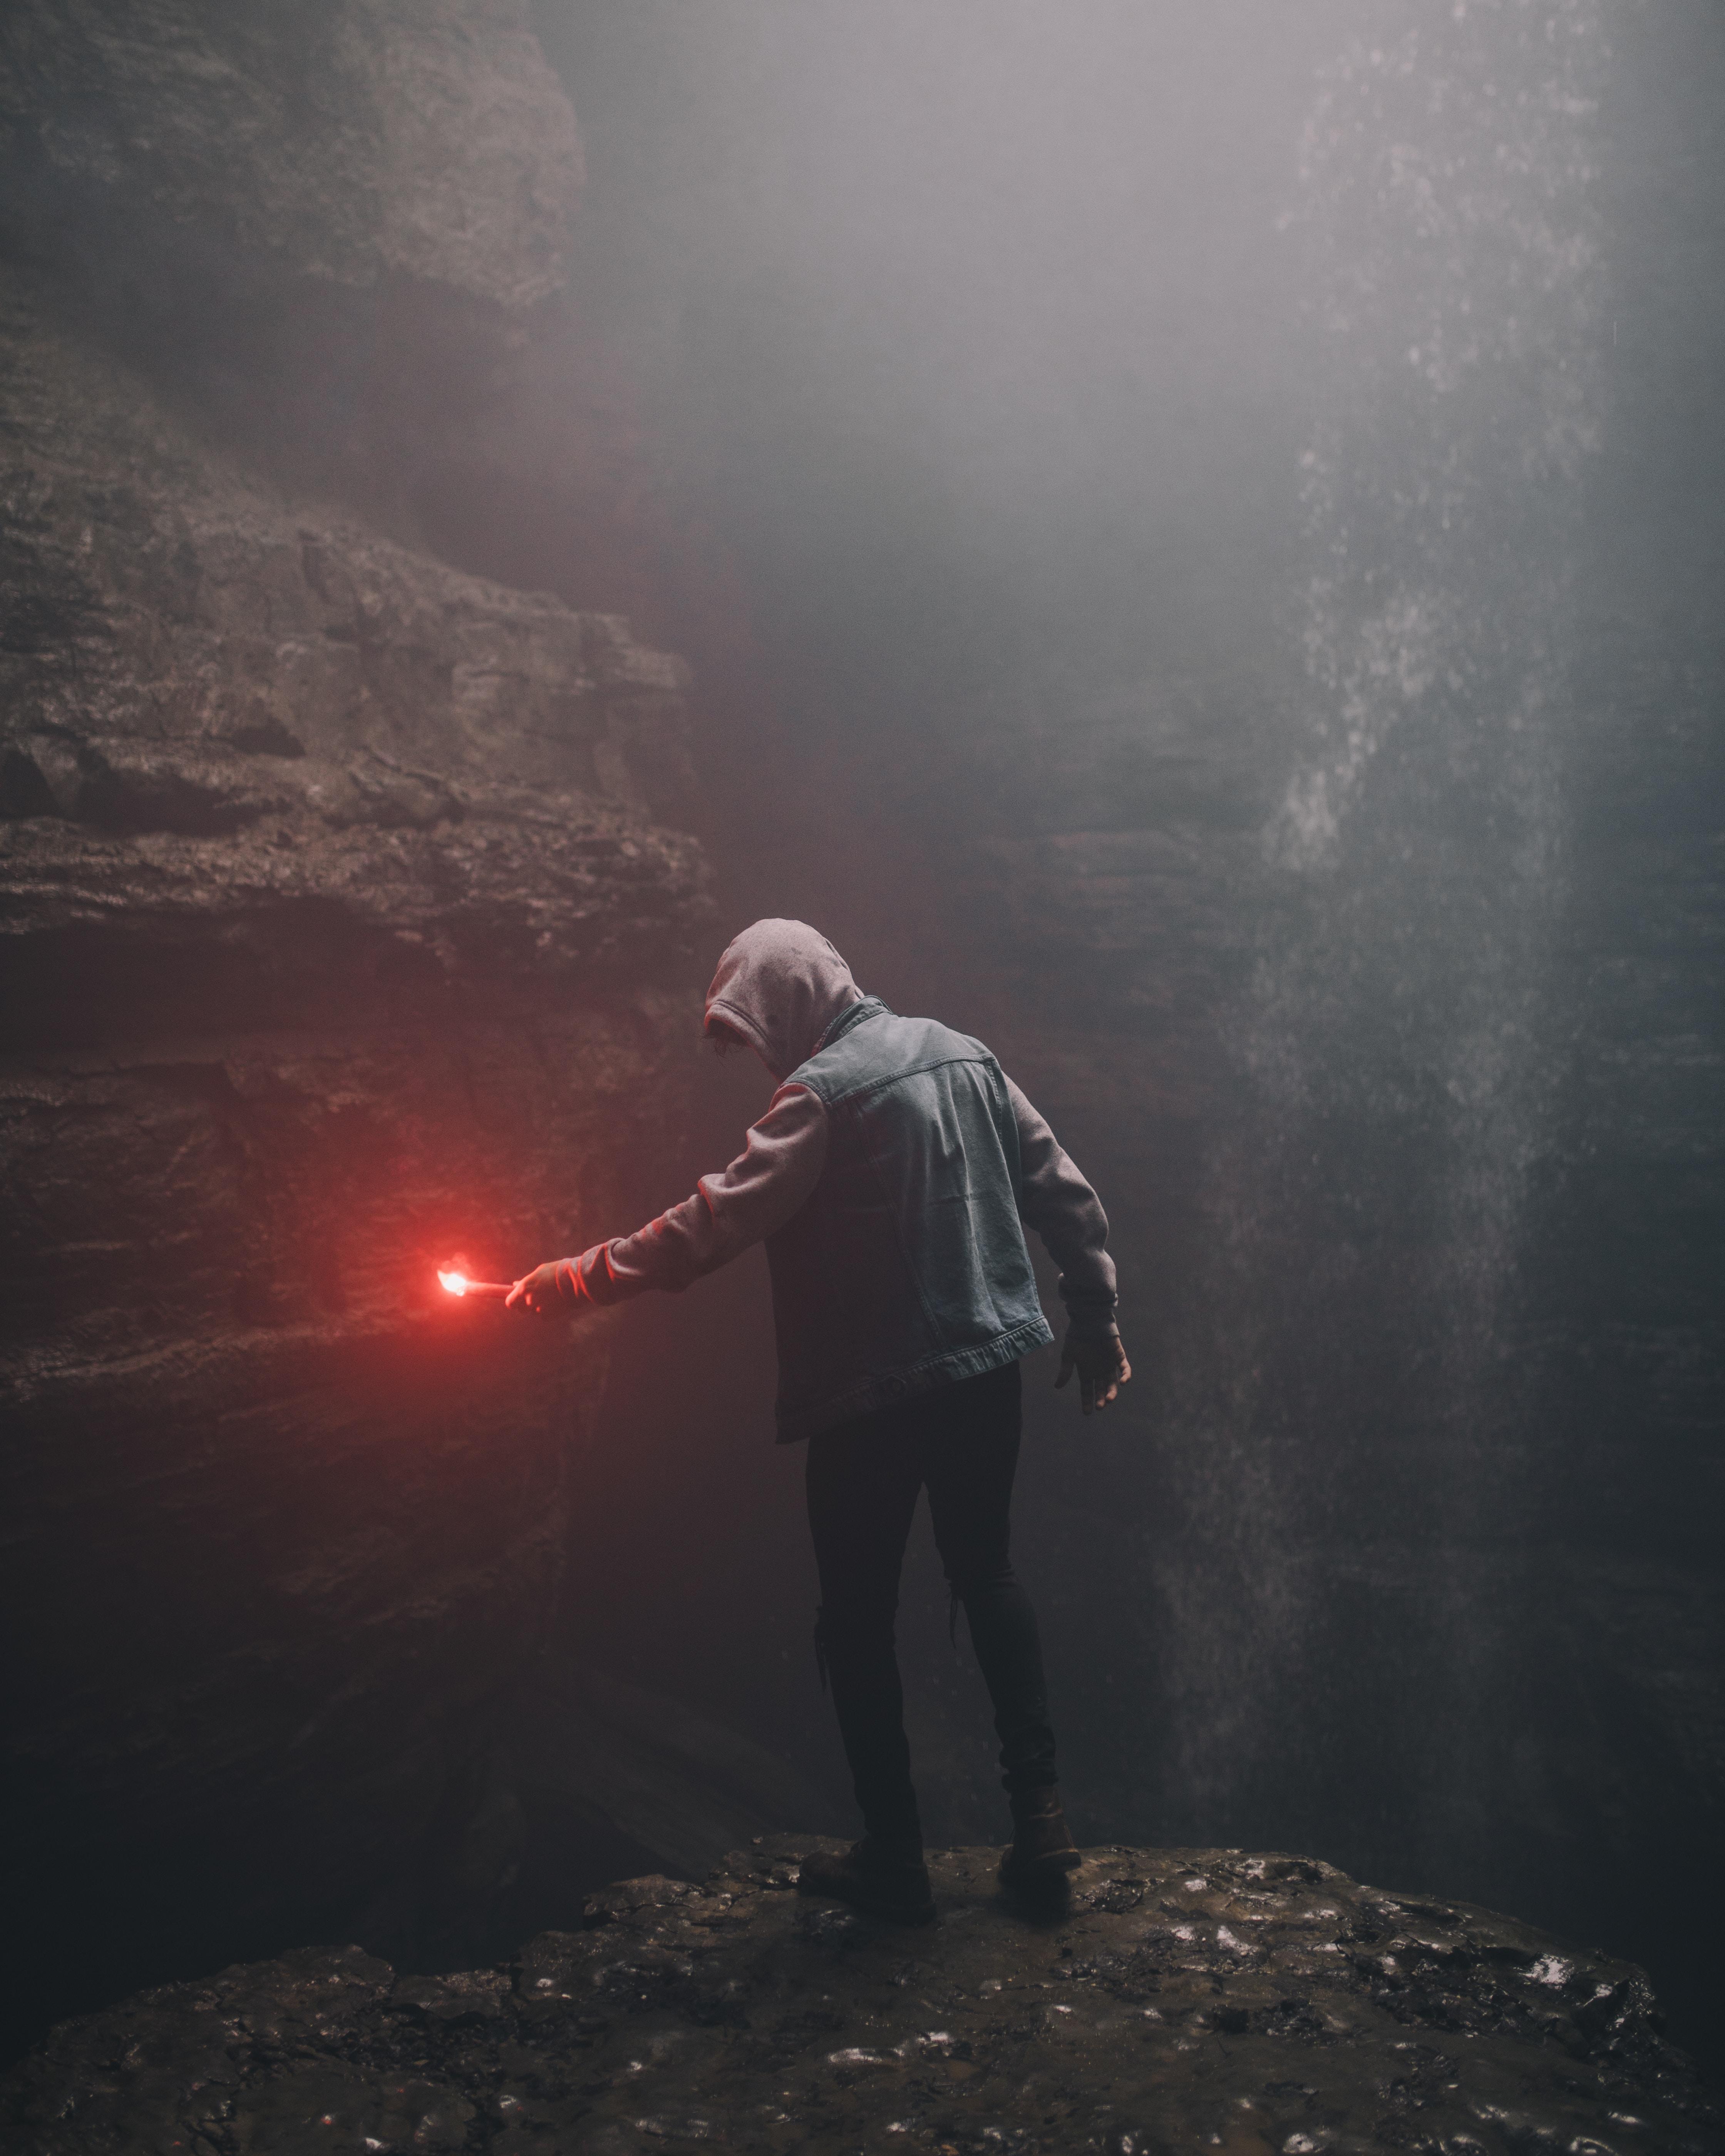 man on edge of cliff holding signal flare light